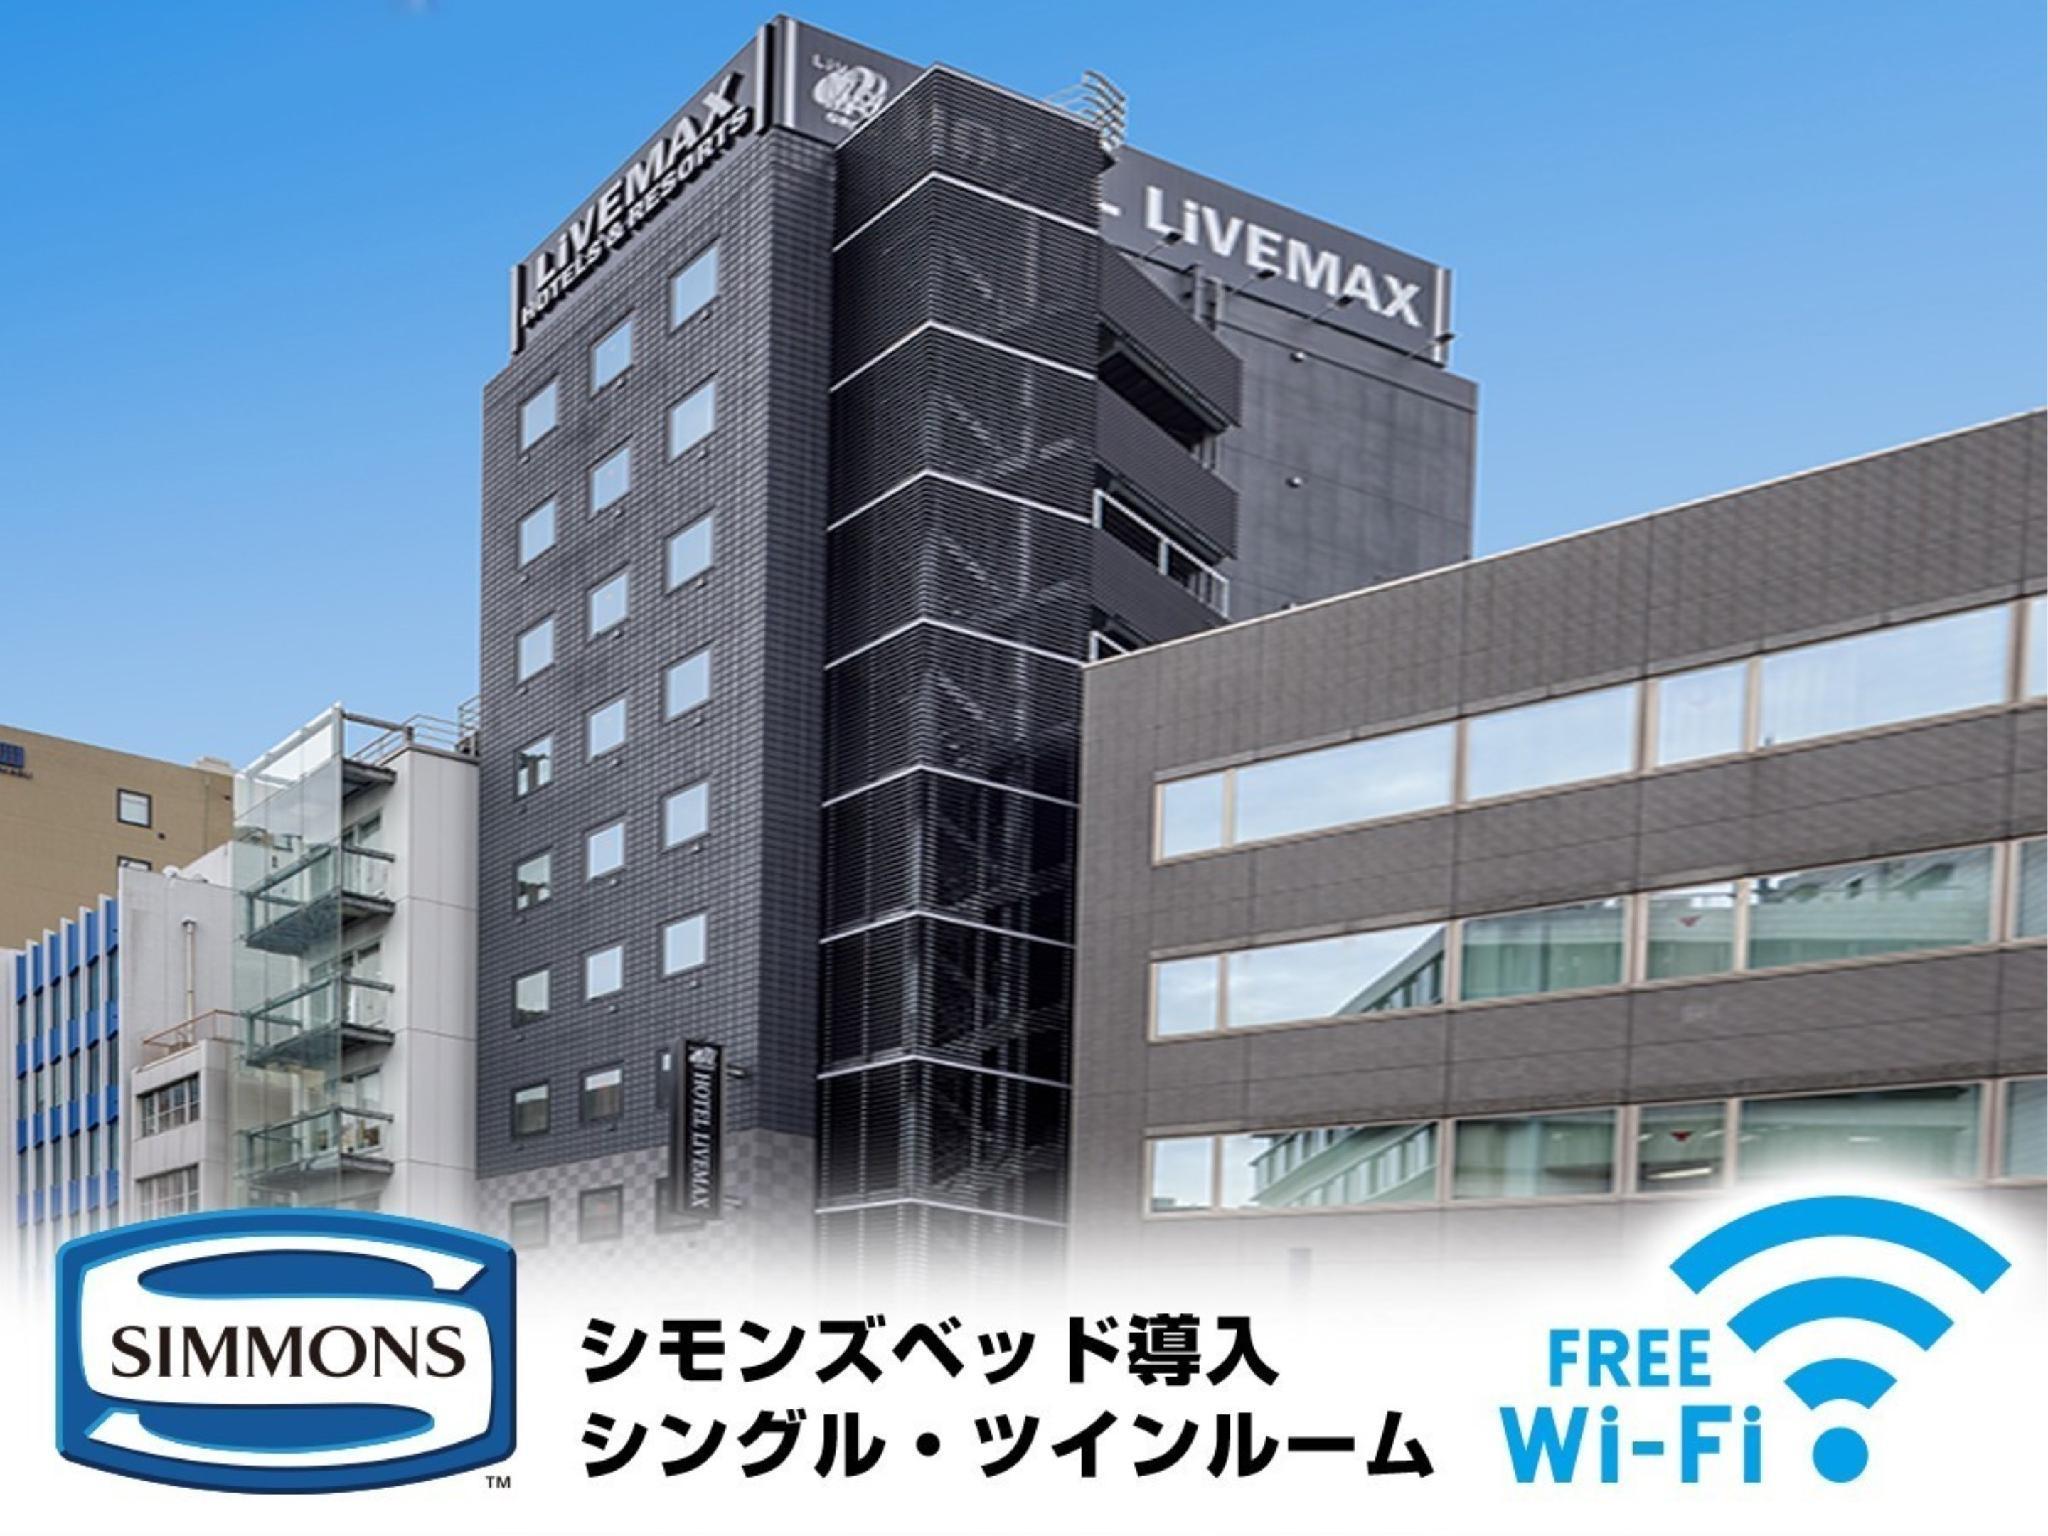 Hotel LiVEMAX Akasaka